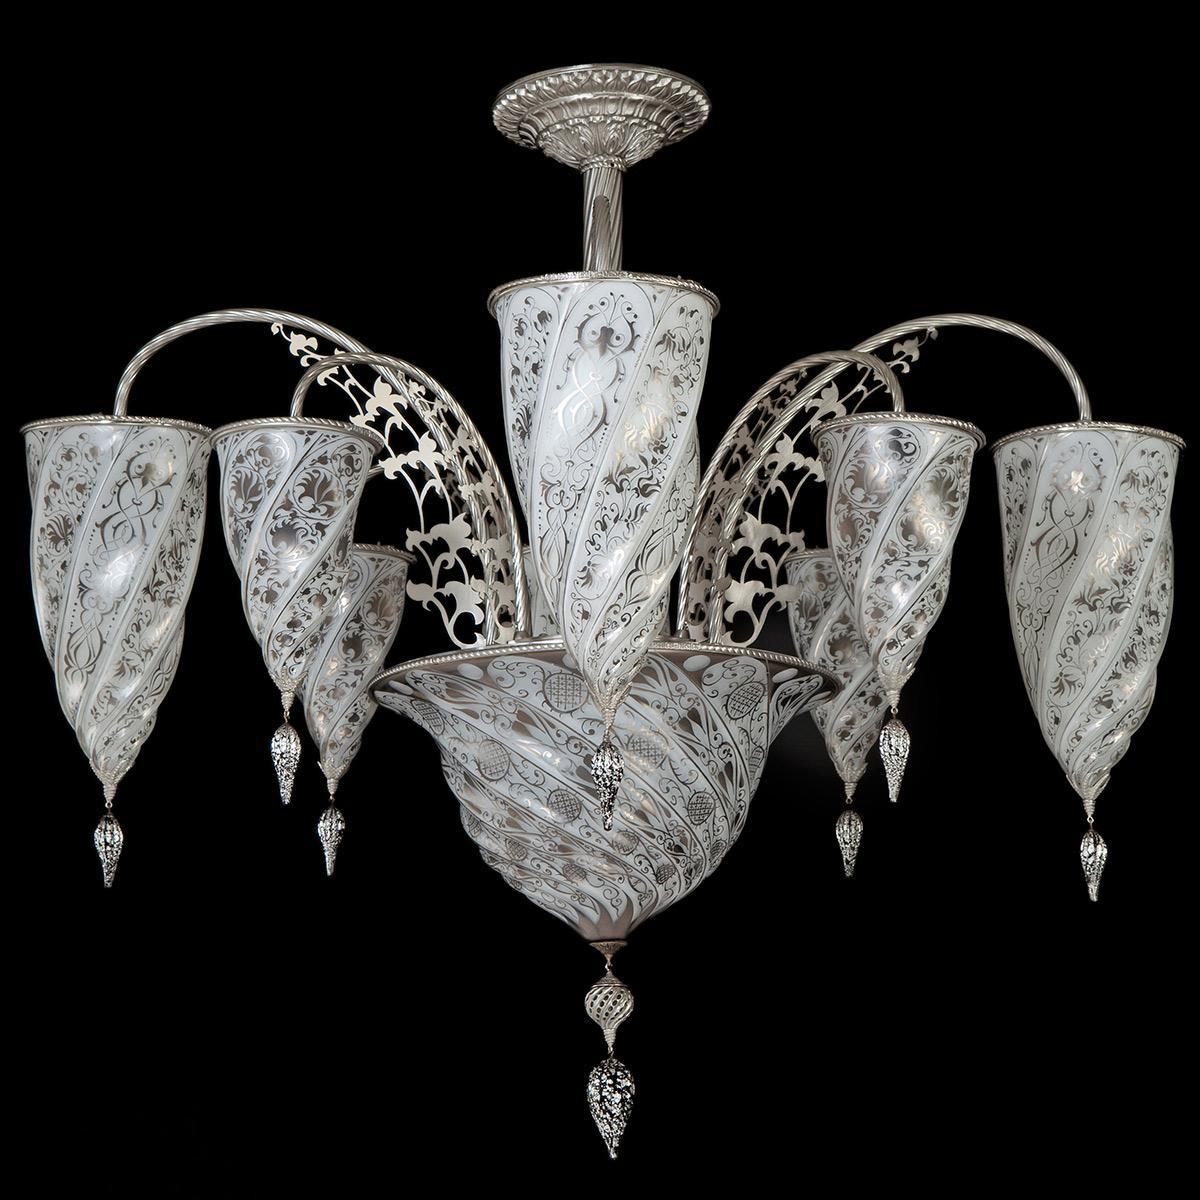 """Giza"" Murano glass chandelier - 9 lights - white"